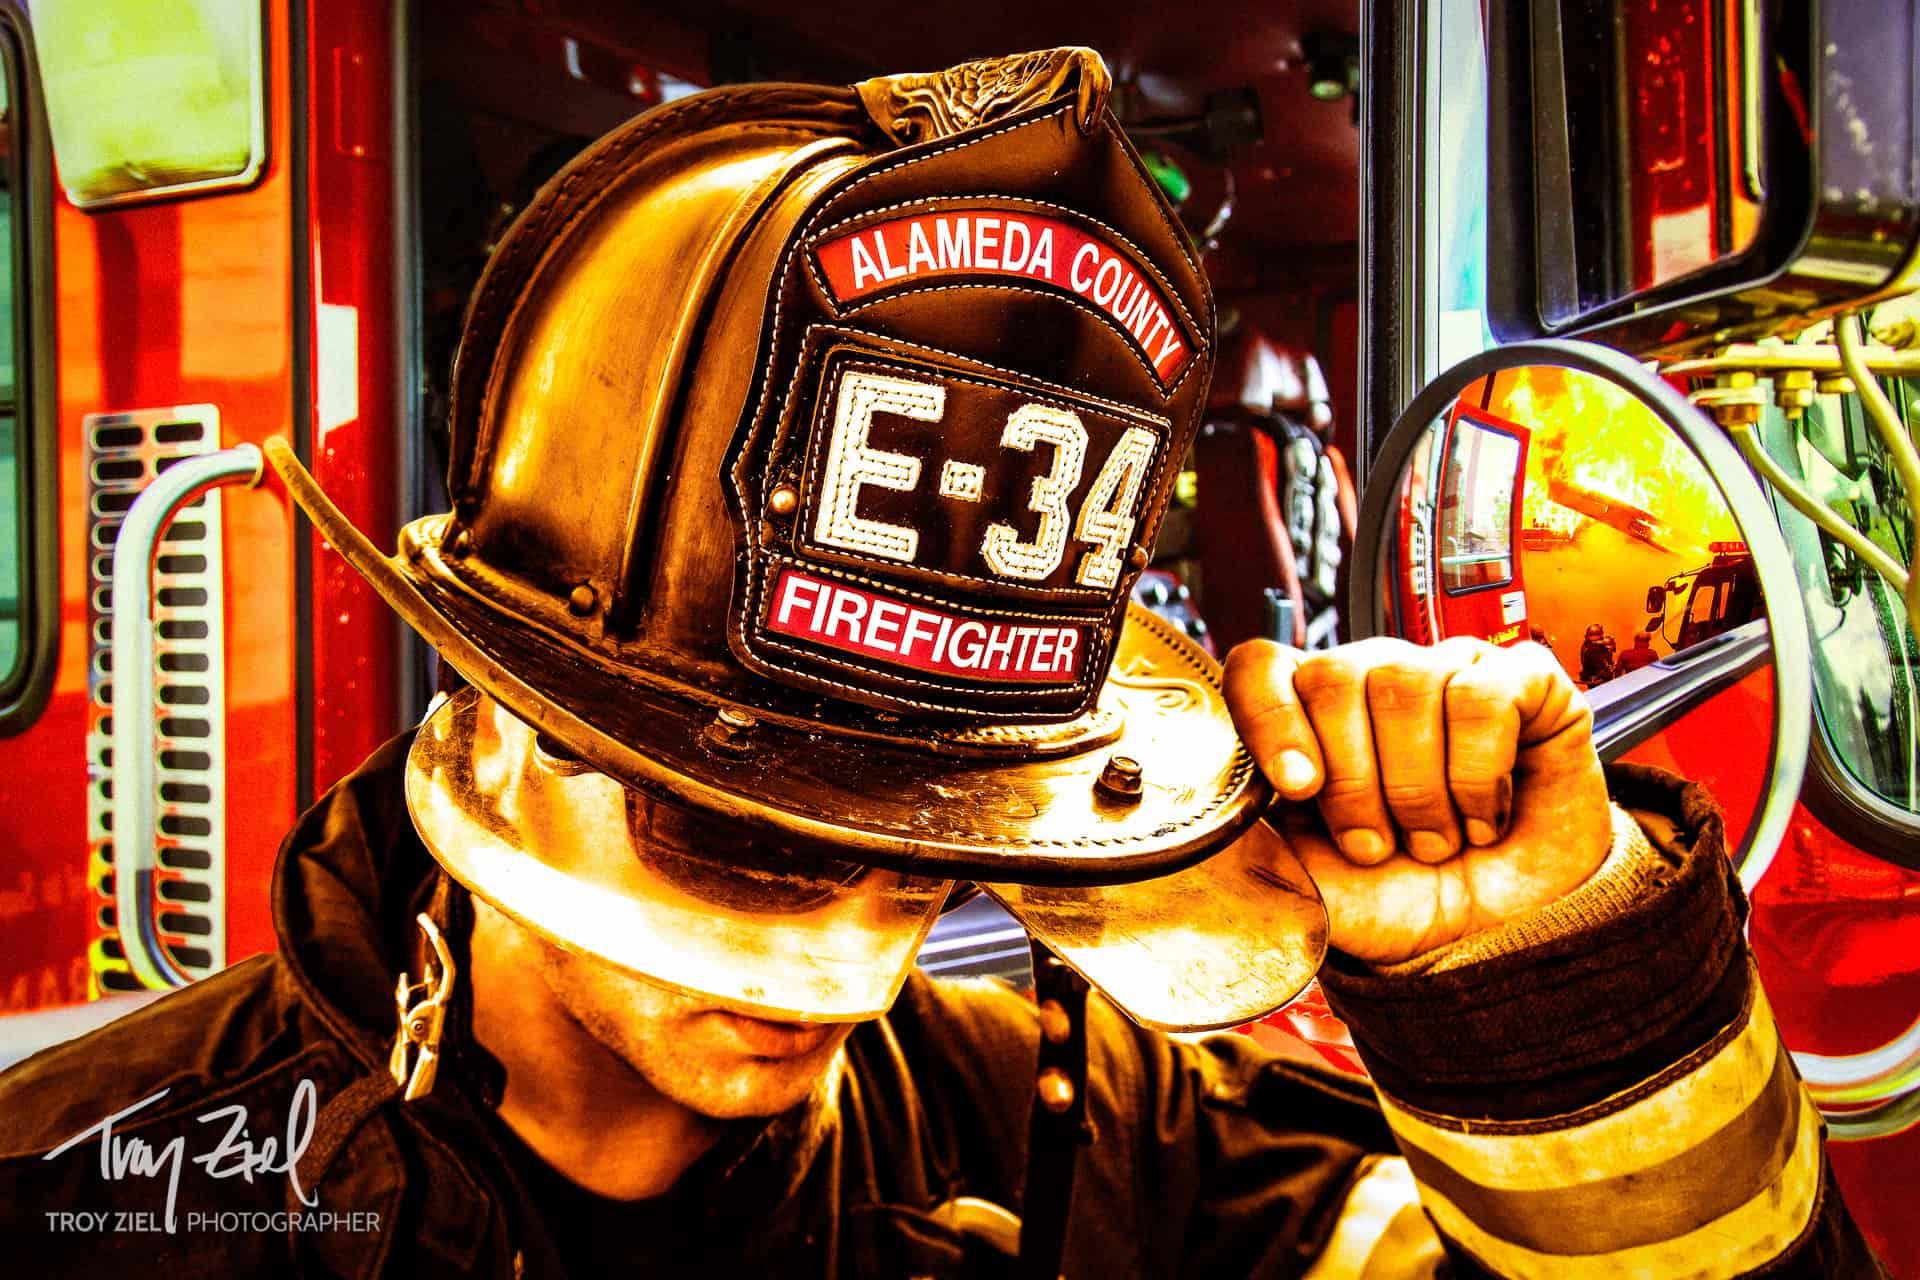 Firefighter_JimmySinkay_byTroyZiel-3